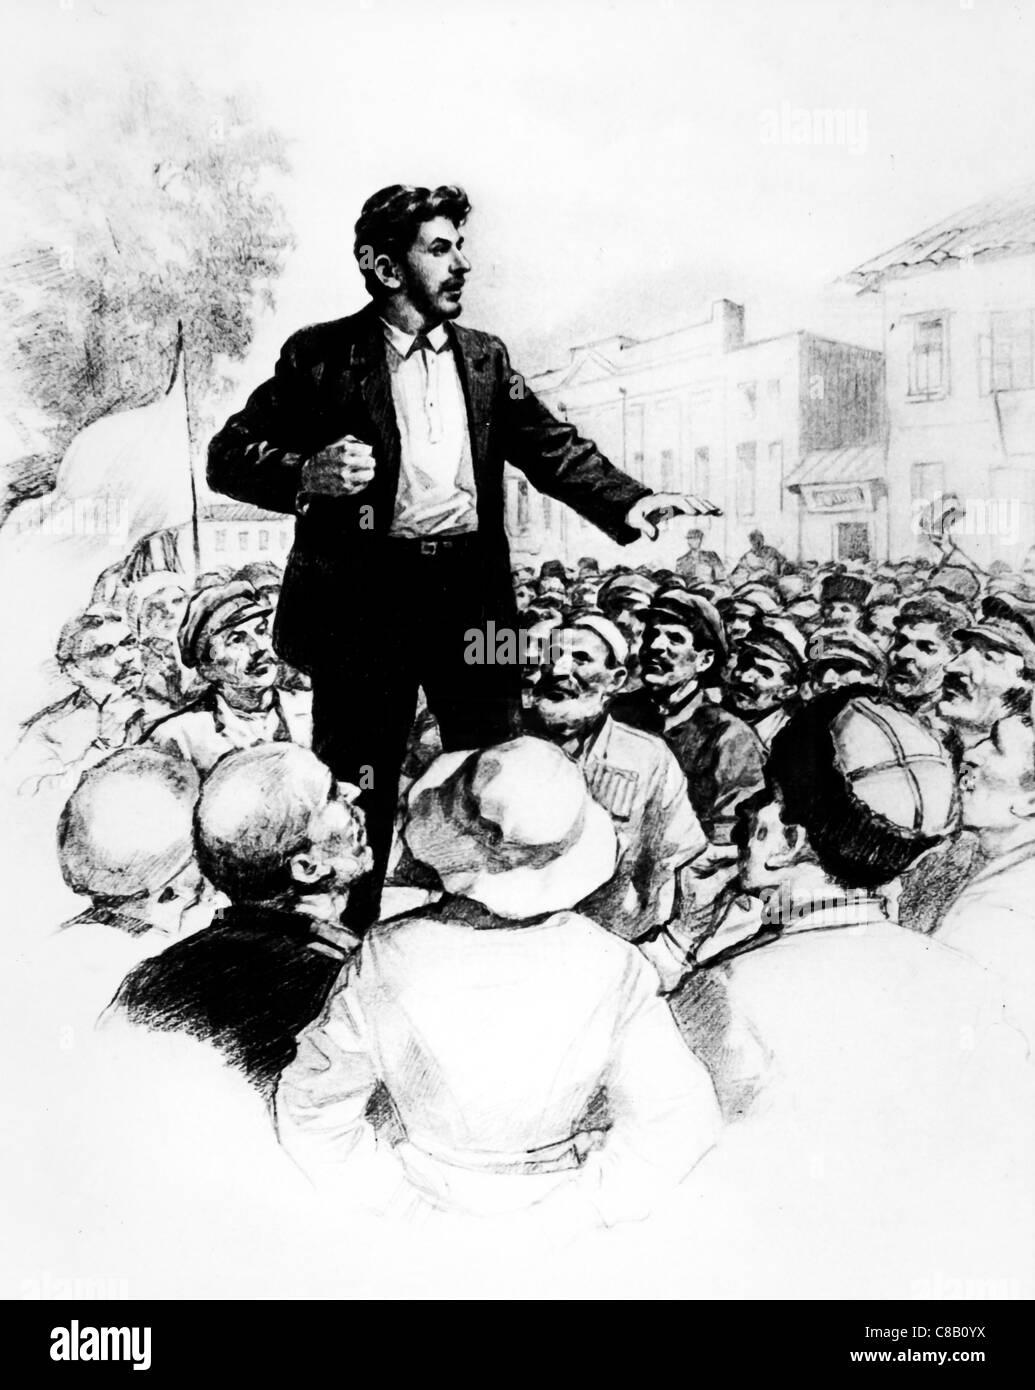 Joseph Stalin speech,1917 - Stock Image